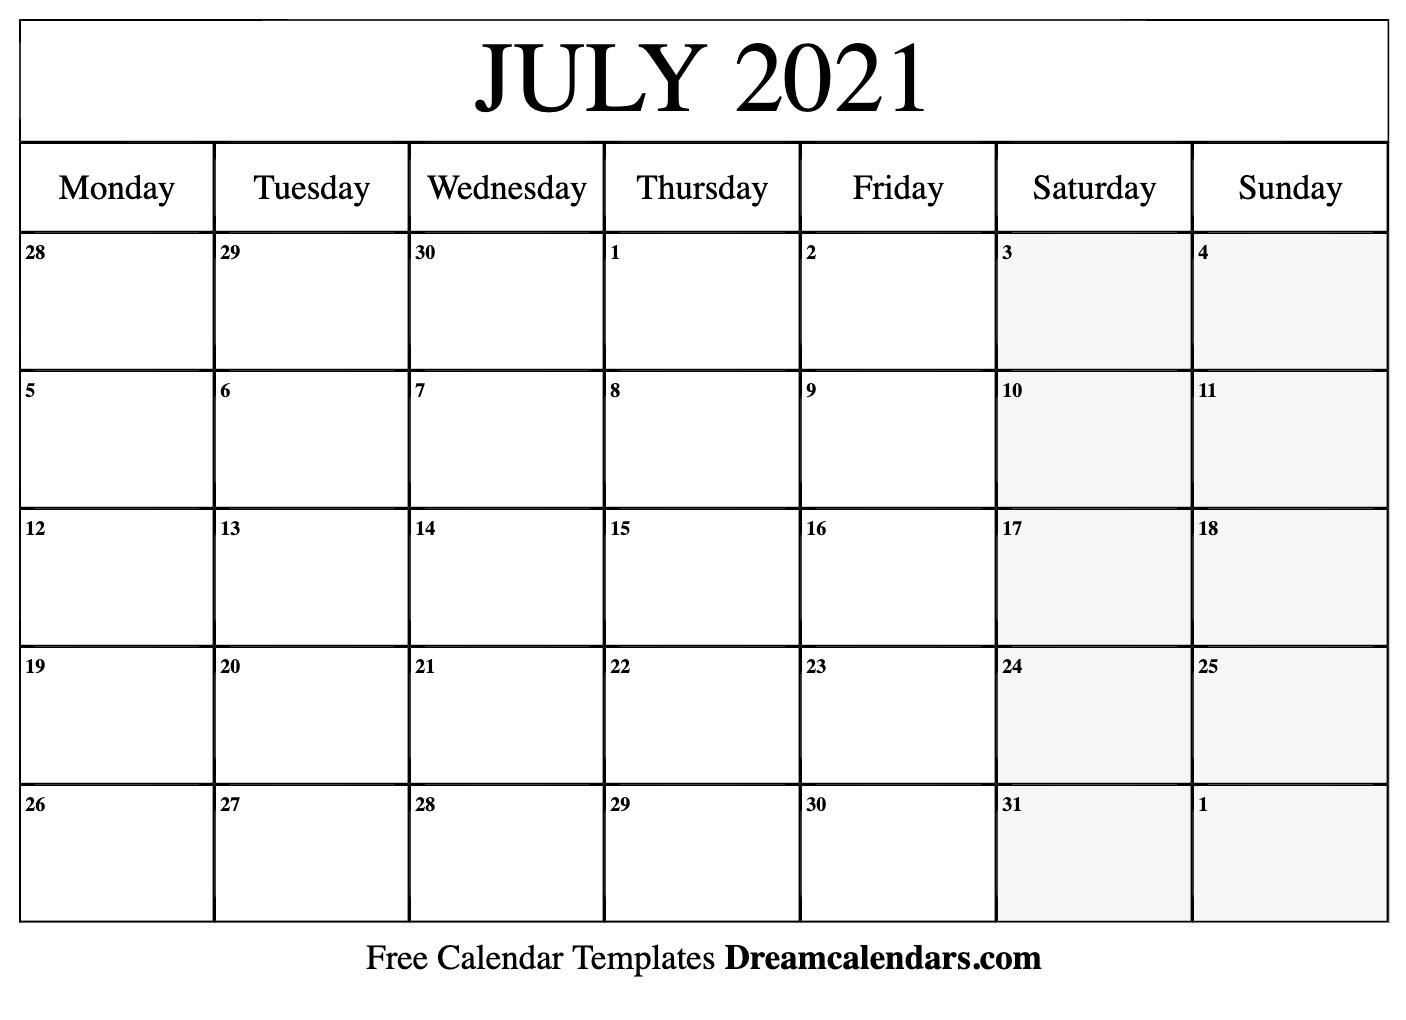 July 2021 Calendar | Free Blank Printable Templates-Printable Monday - Friday July 2021